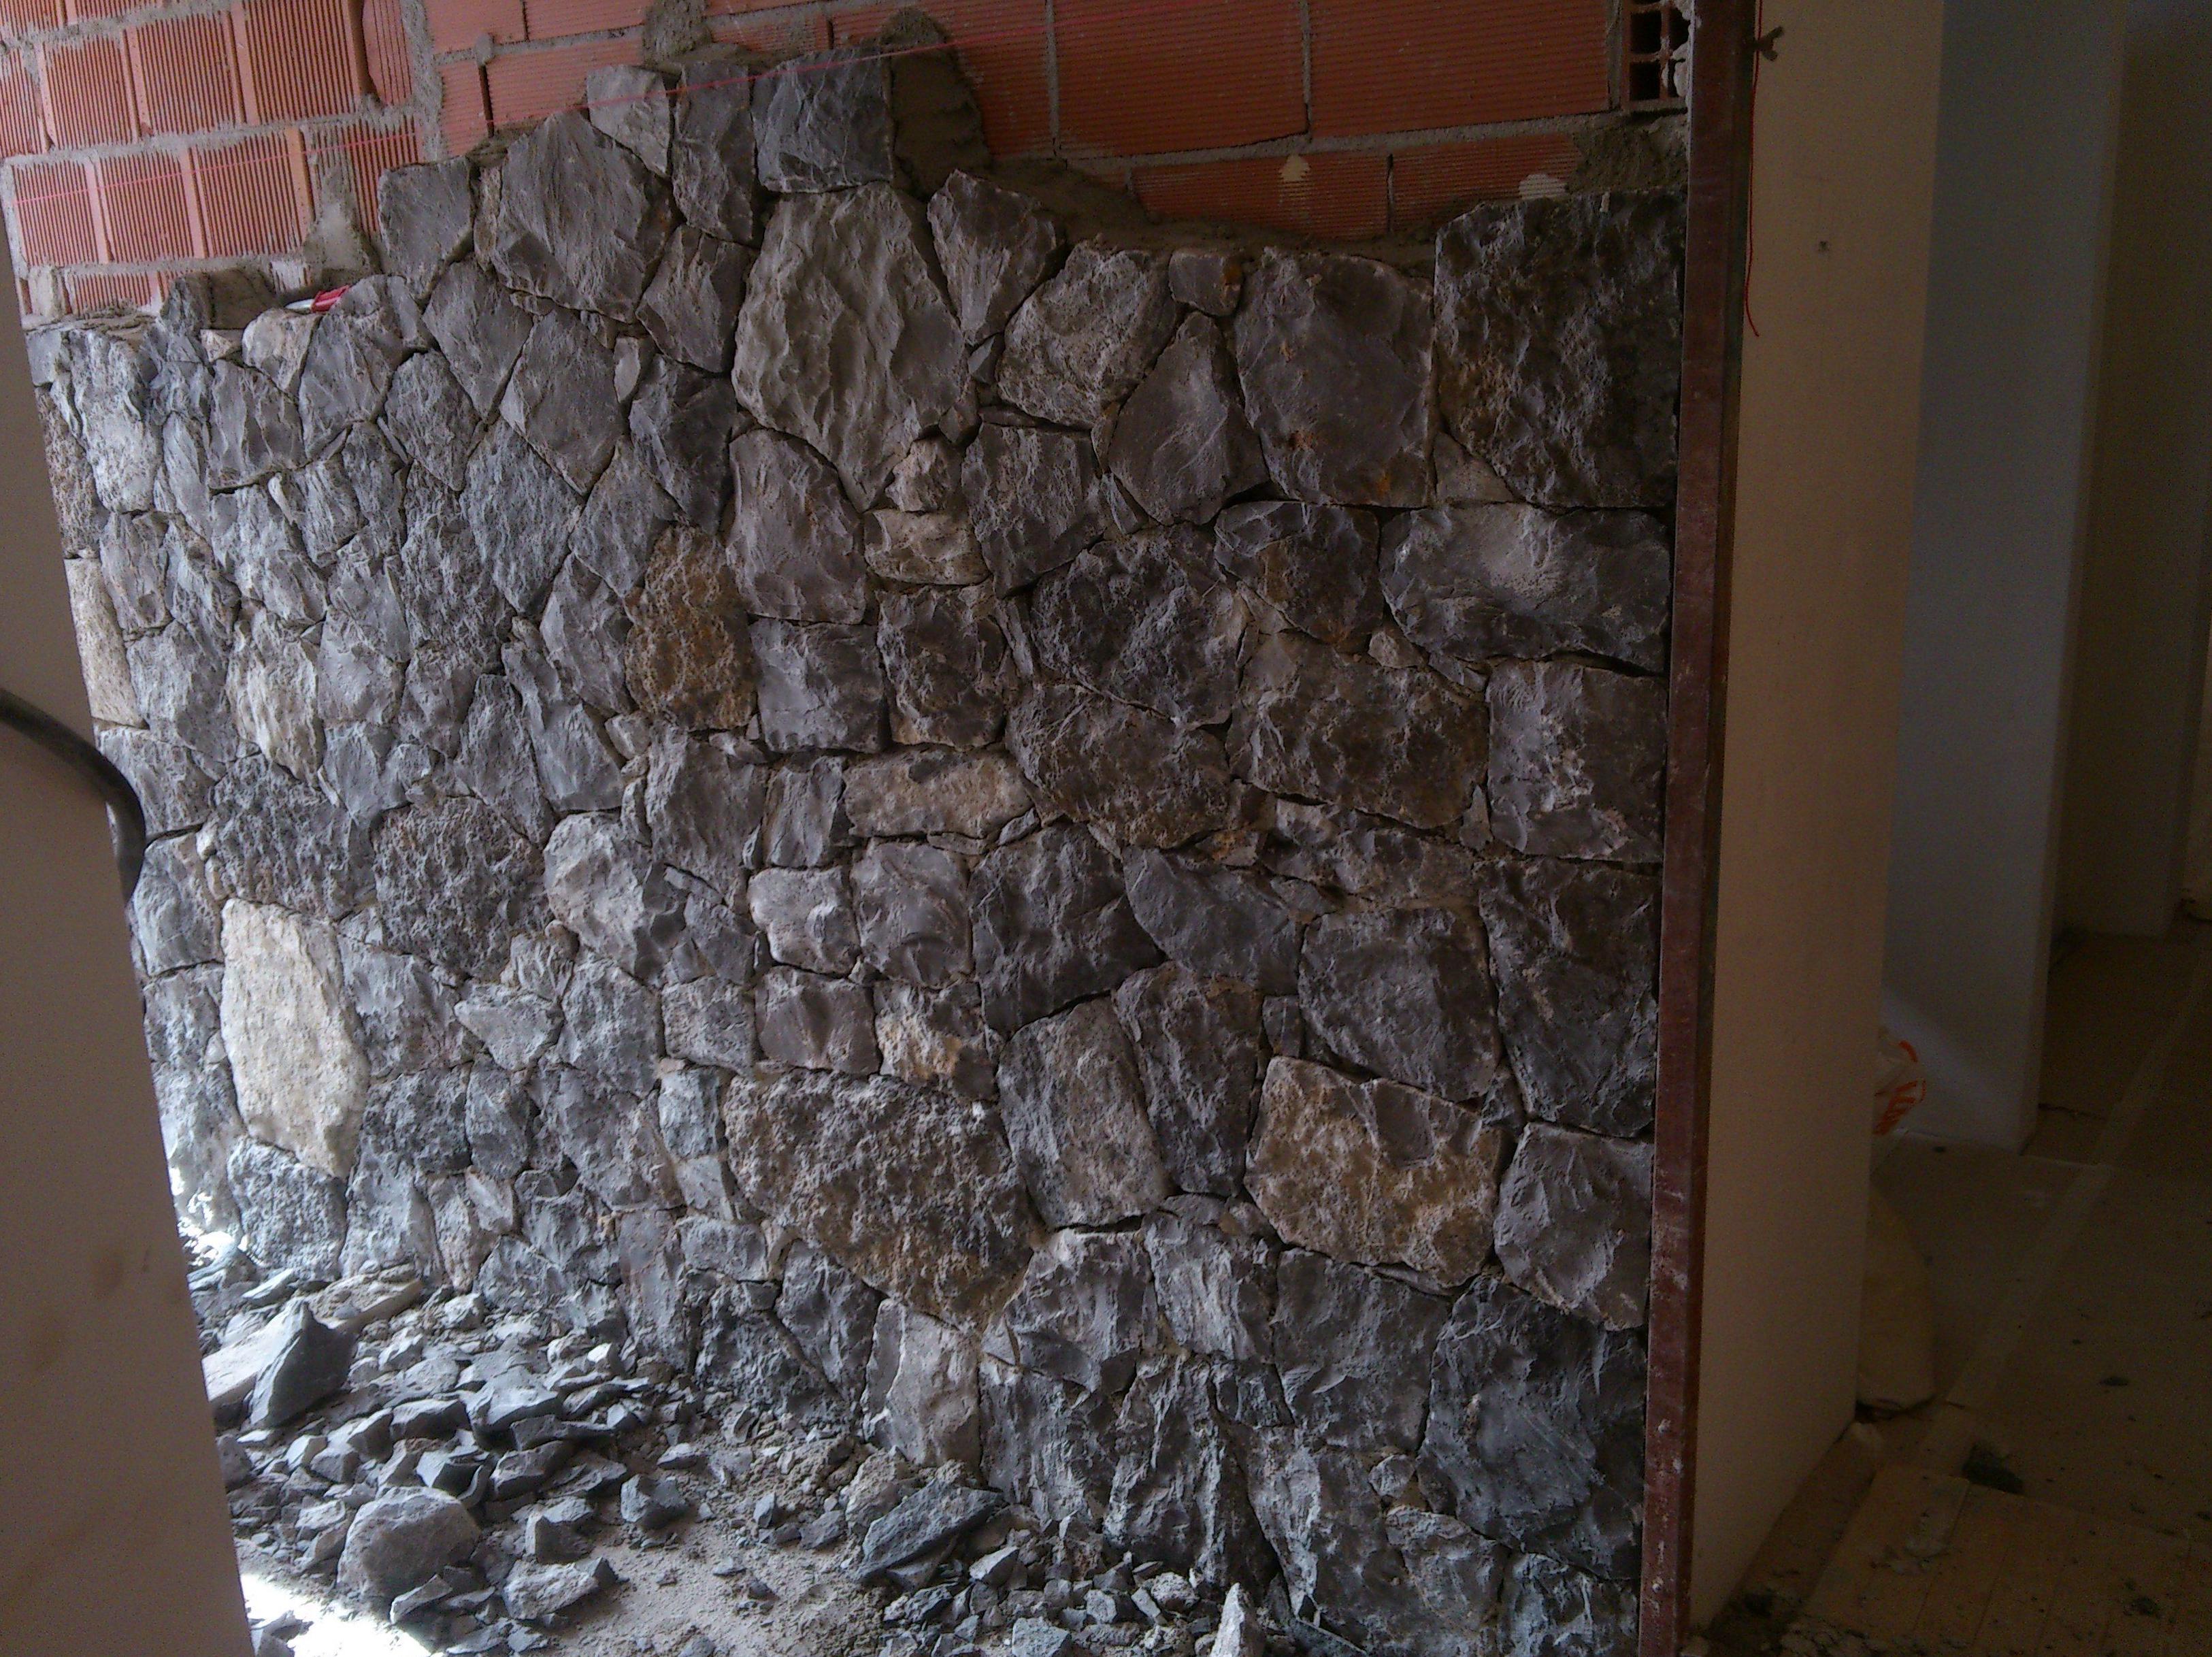 Mamposteria concertada ripiada en piedra negra de altea - Piedra de silleria ...